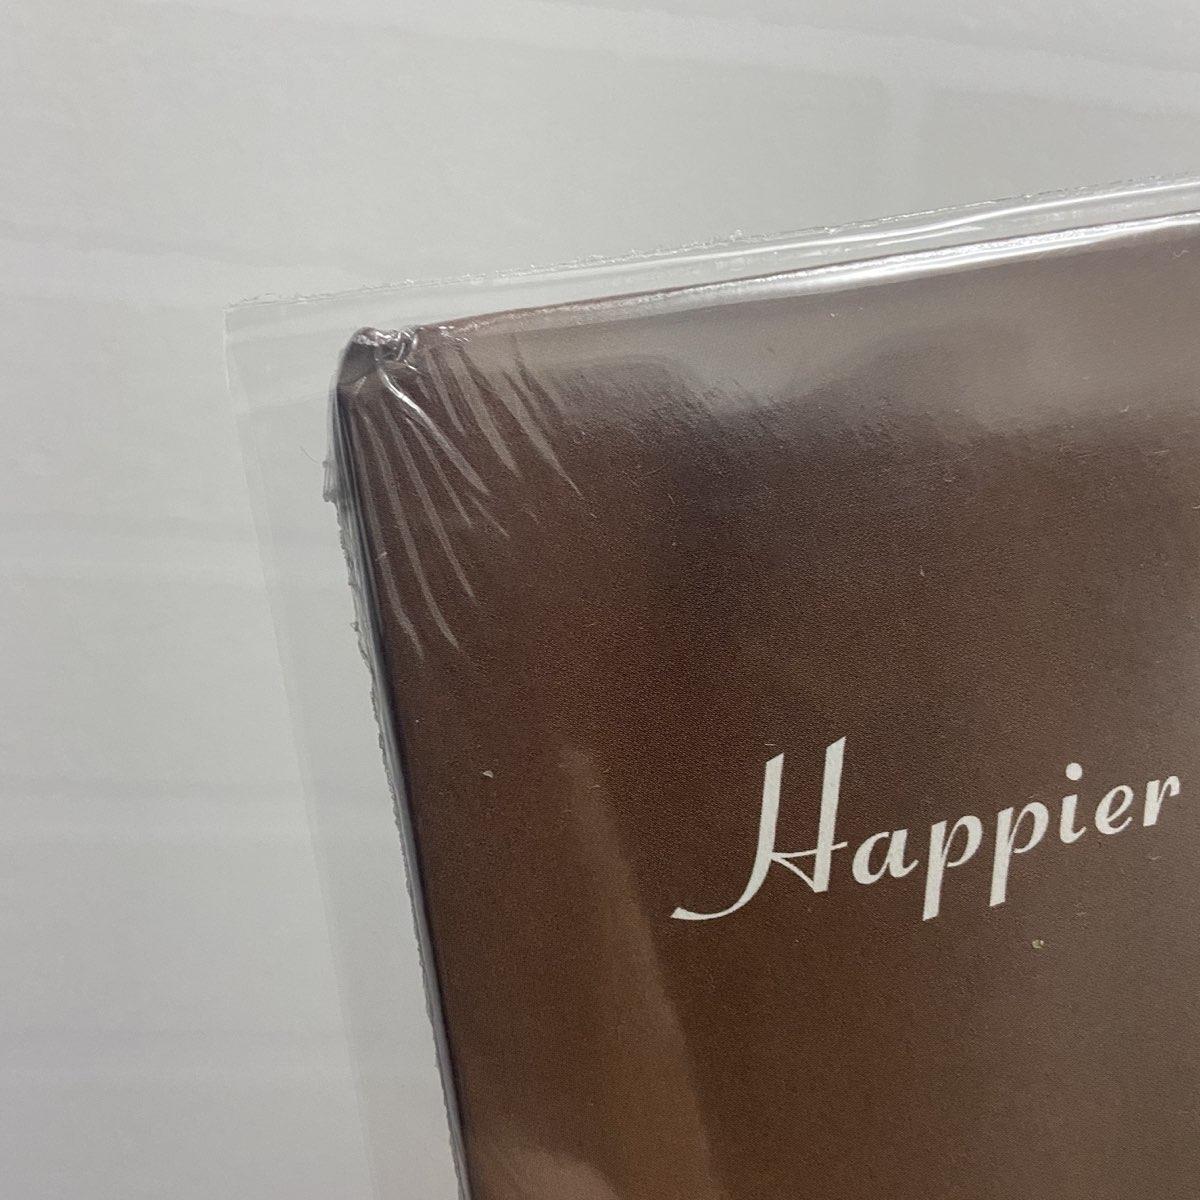 OUTLET - Billie Eilish - Happier Than Ever [Opaque Sienna Vinyl - Urban Outfittersl] - PEQUENA AVARIA - LEIA A DESCRIÇÃO